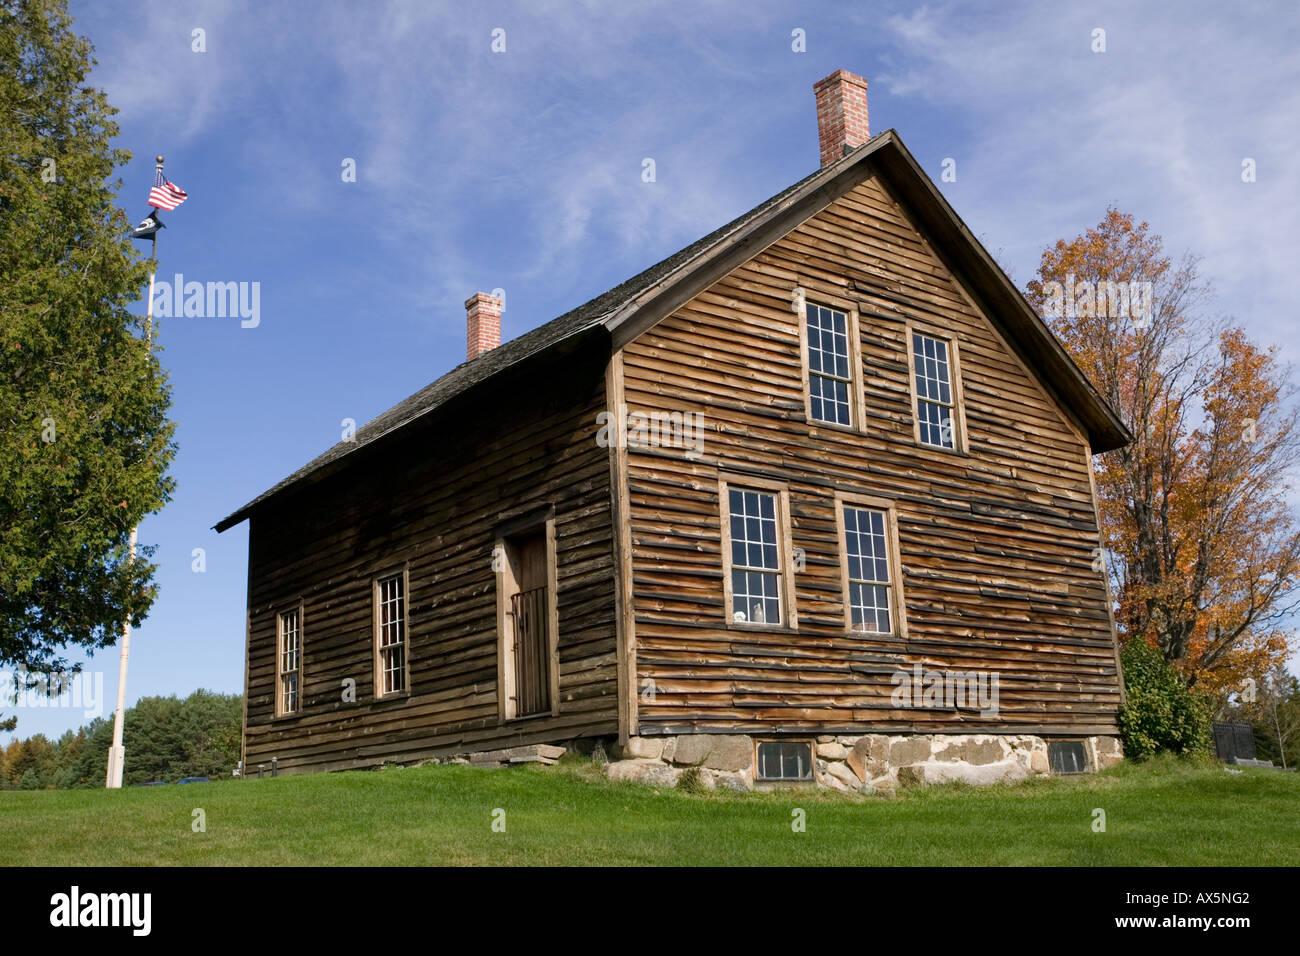 New york essex county keene - John Brown Farm And Gravesite State Historic Site North Elba New York Near Lake Placid Adirondack